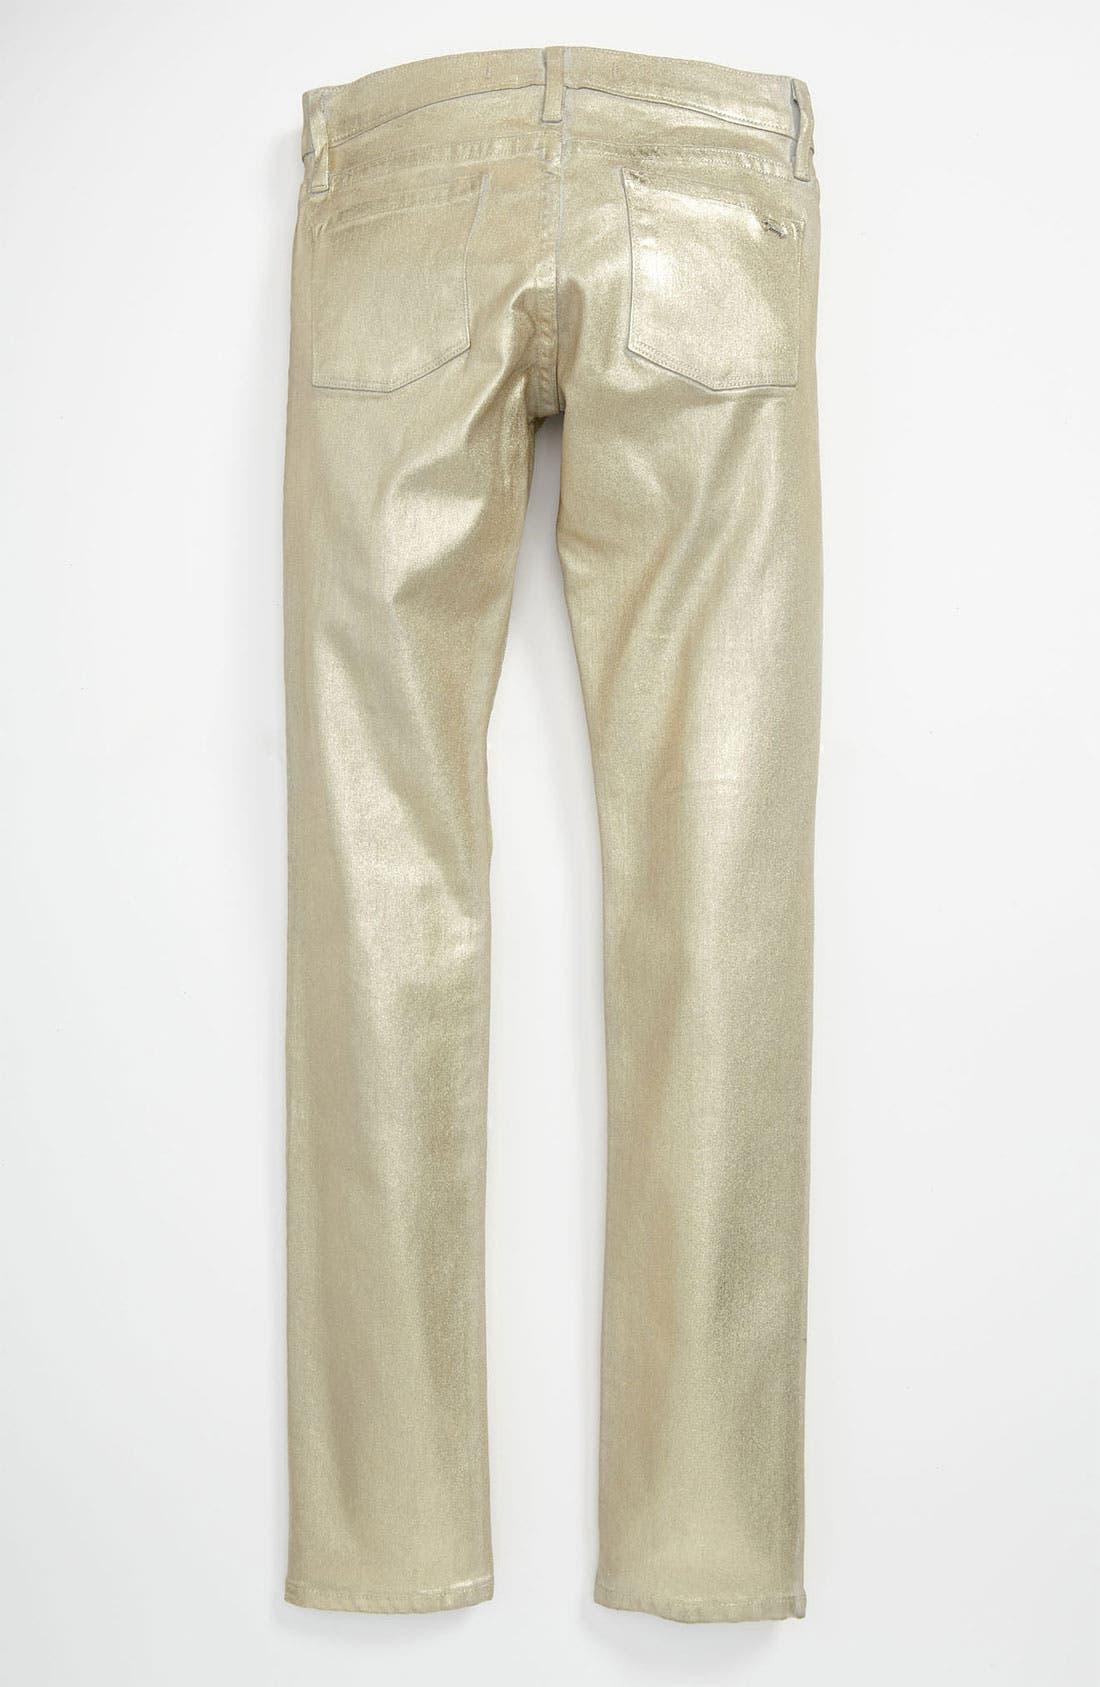 Alternate Image 1 Selected - Juicy Couture Metallic Skinny Pants (Little Girls & Big Girls)